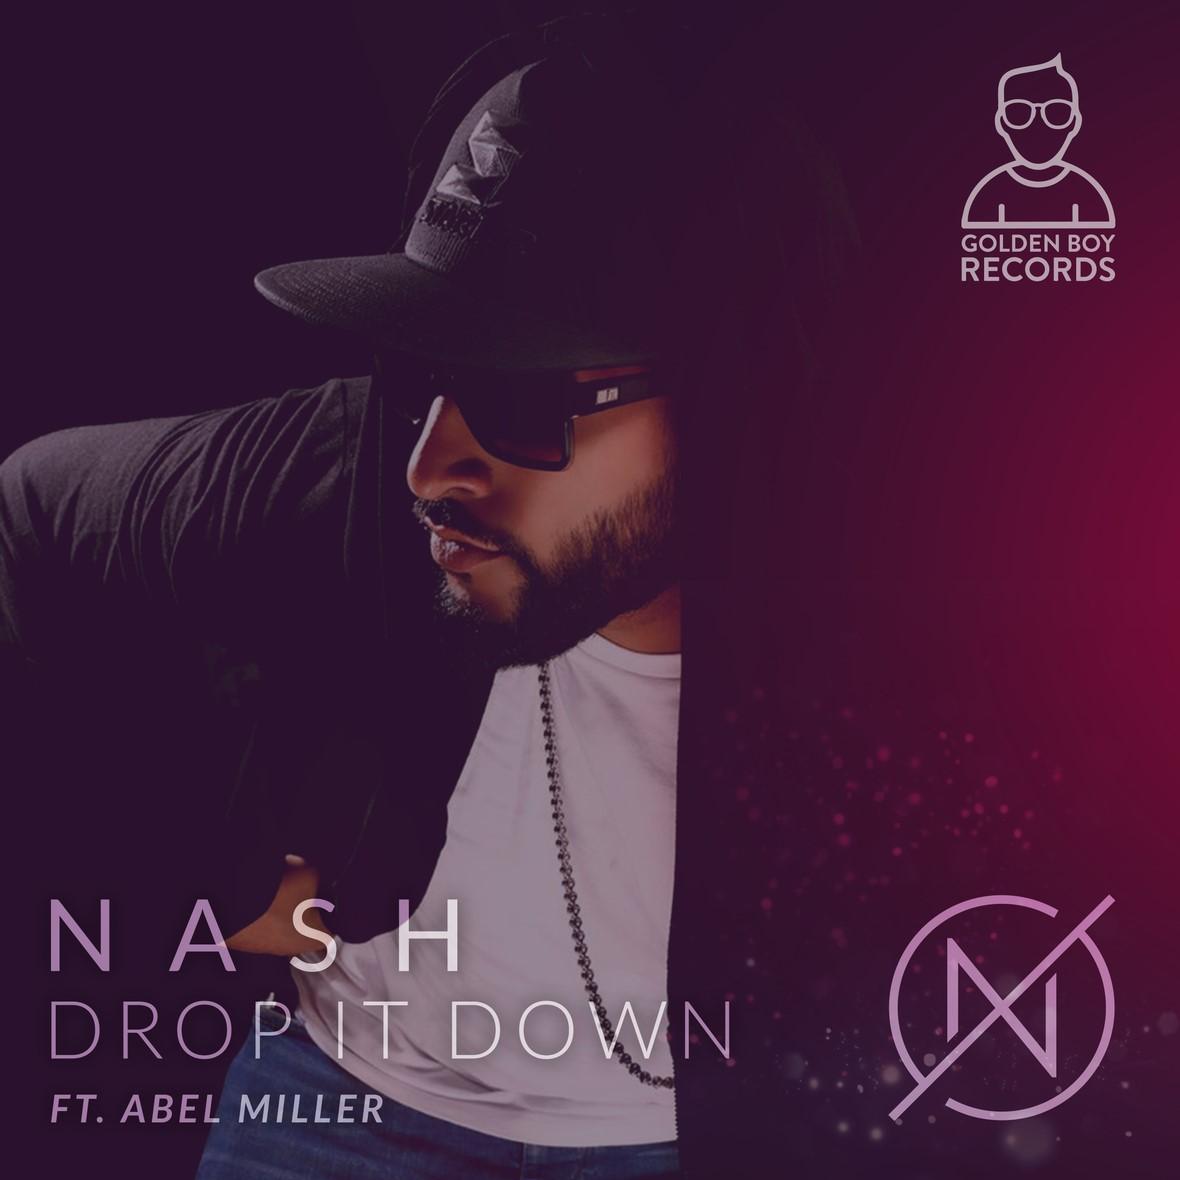 NEW RELEASE: NASH FT. ABEL MILLER – DROP IT DOWN